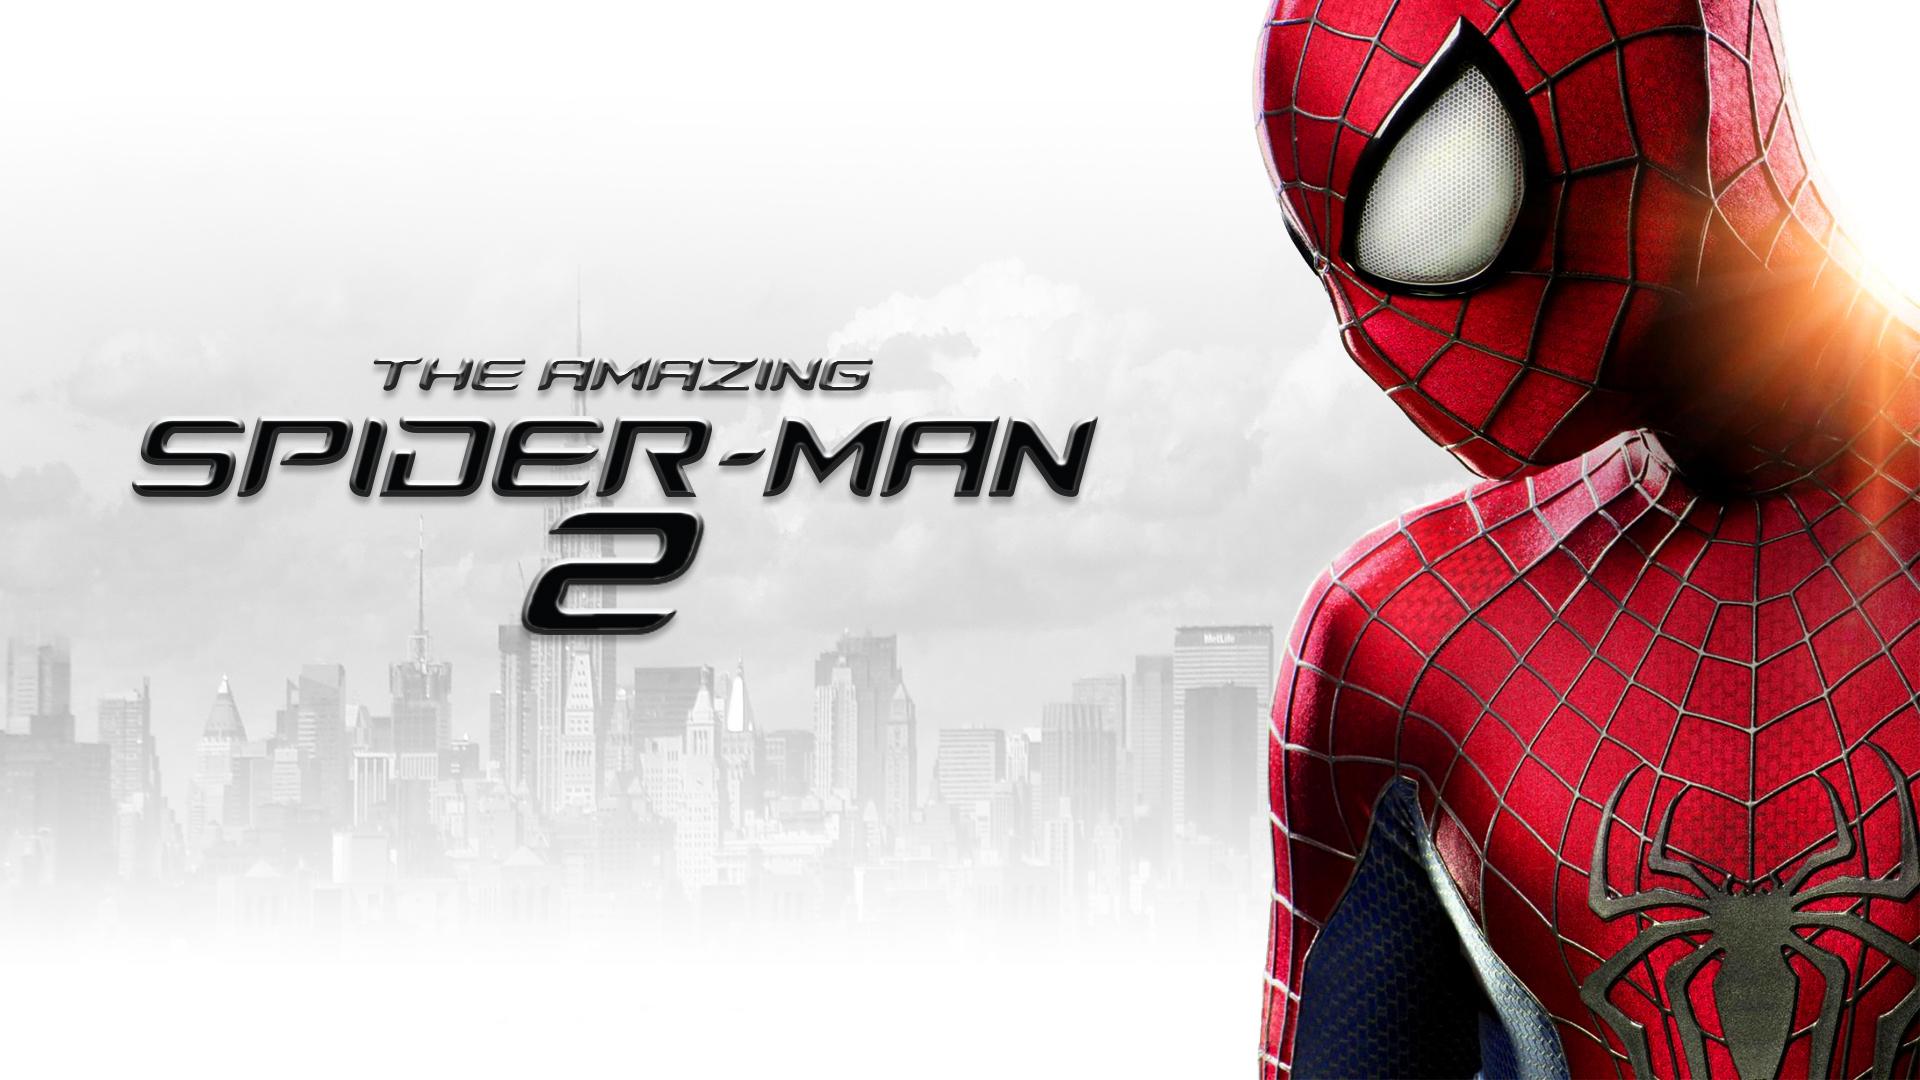 Amazing spider man logo wallpaper - photo#53